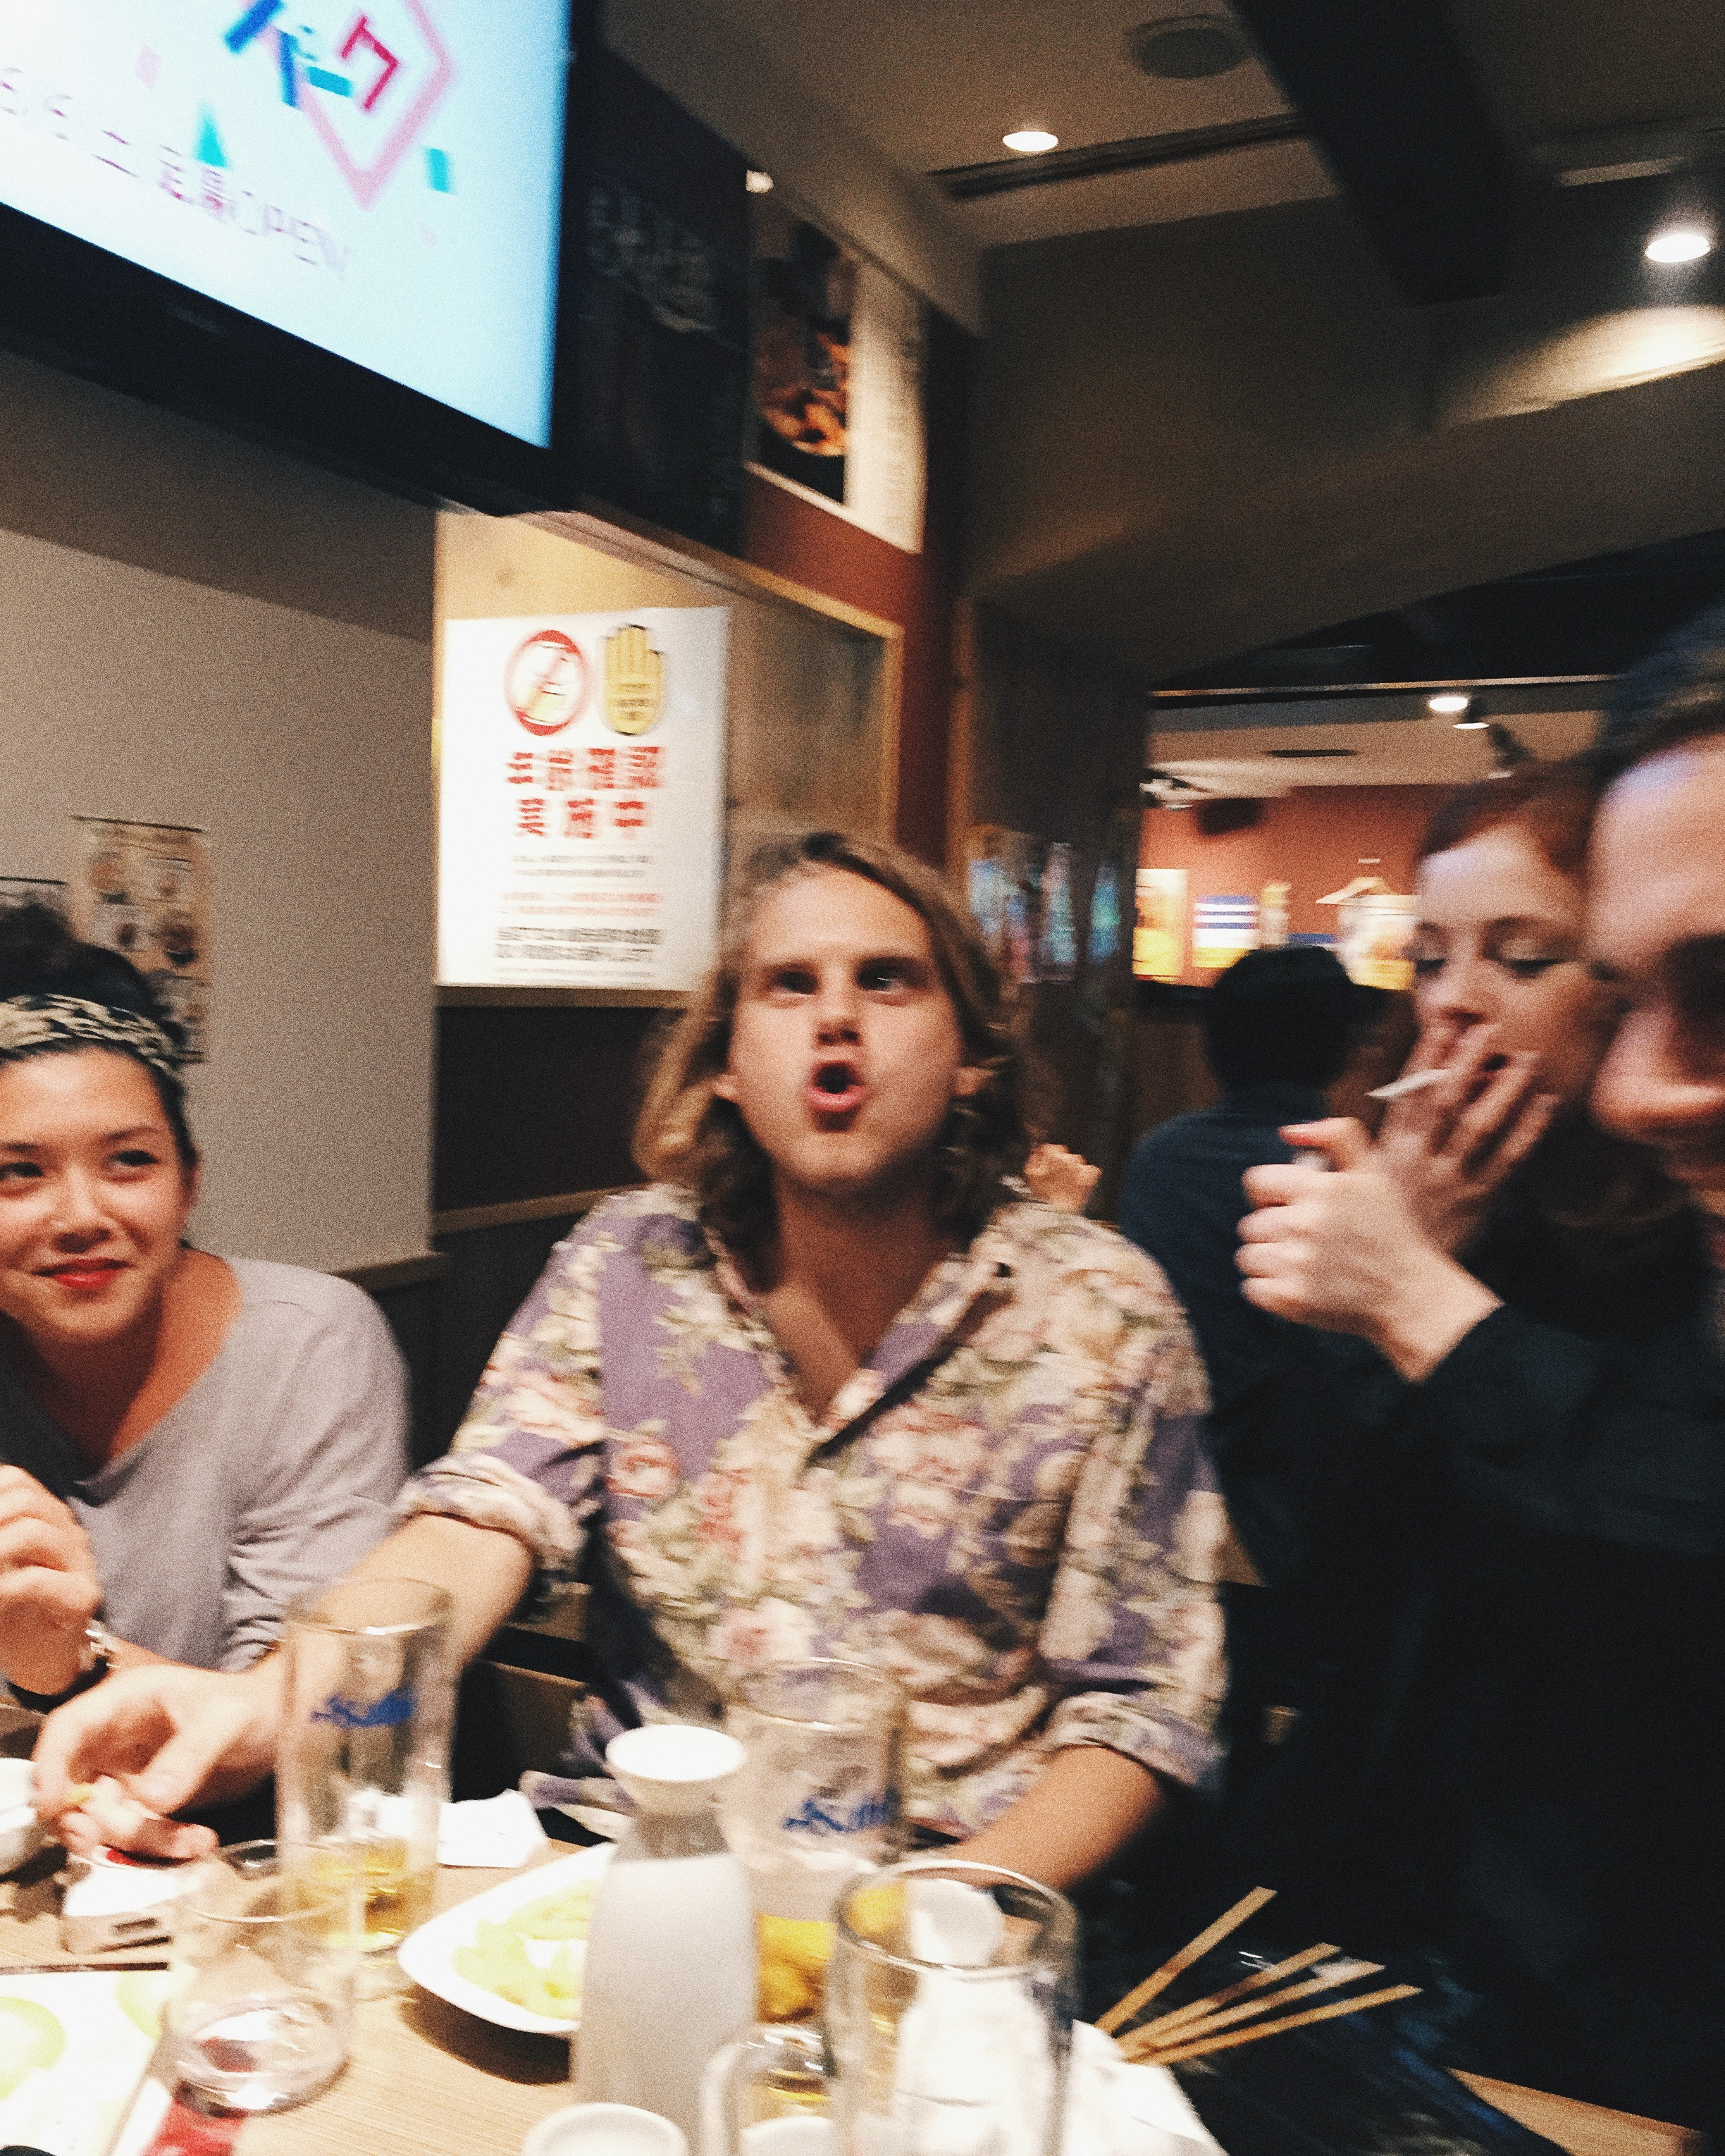 Hannah, Johan and Anna. Shibuya, Summer 2015.